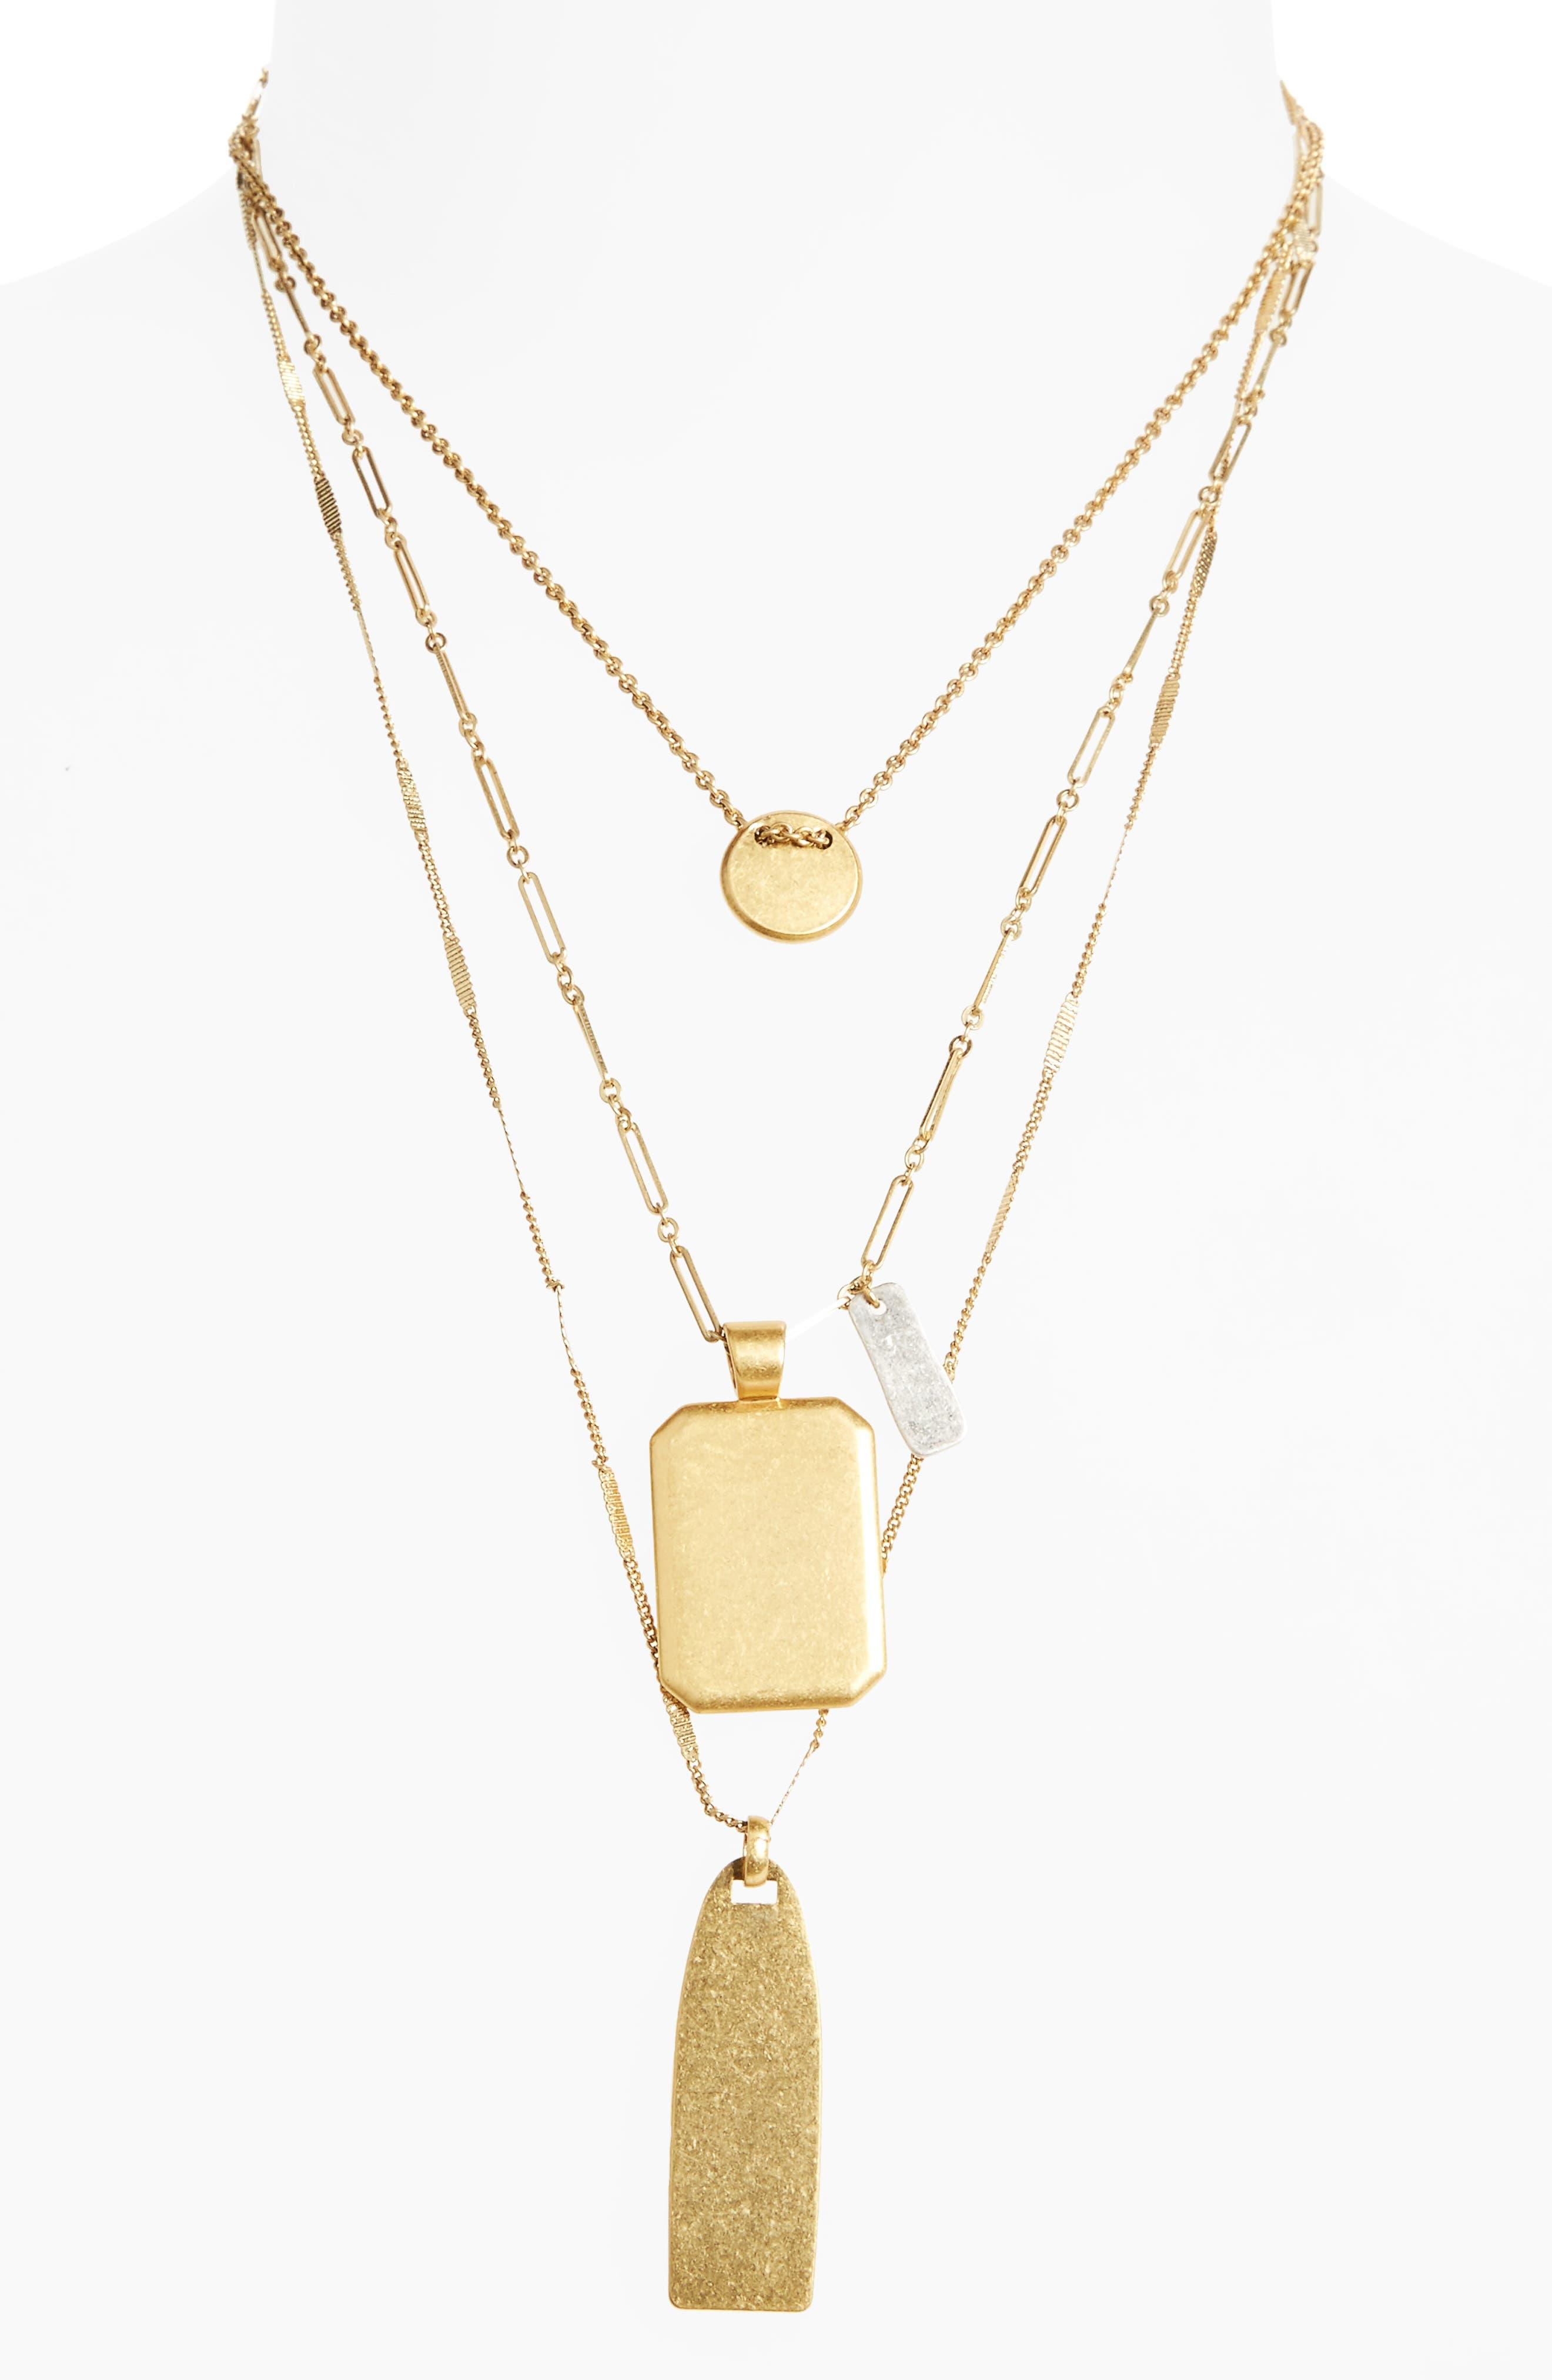 MADEWELL, Treasure Pendant Necklace Set, Main thumbnail 1, color, MIXED METAL